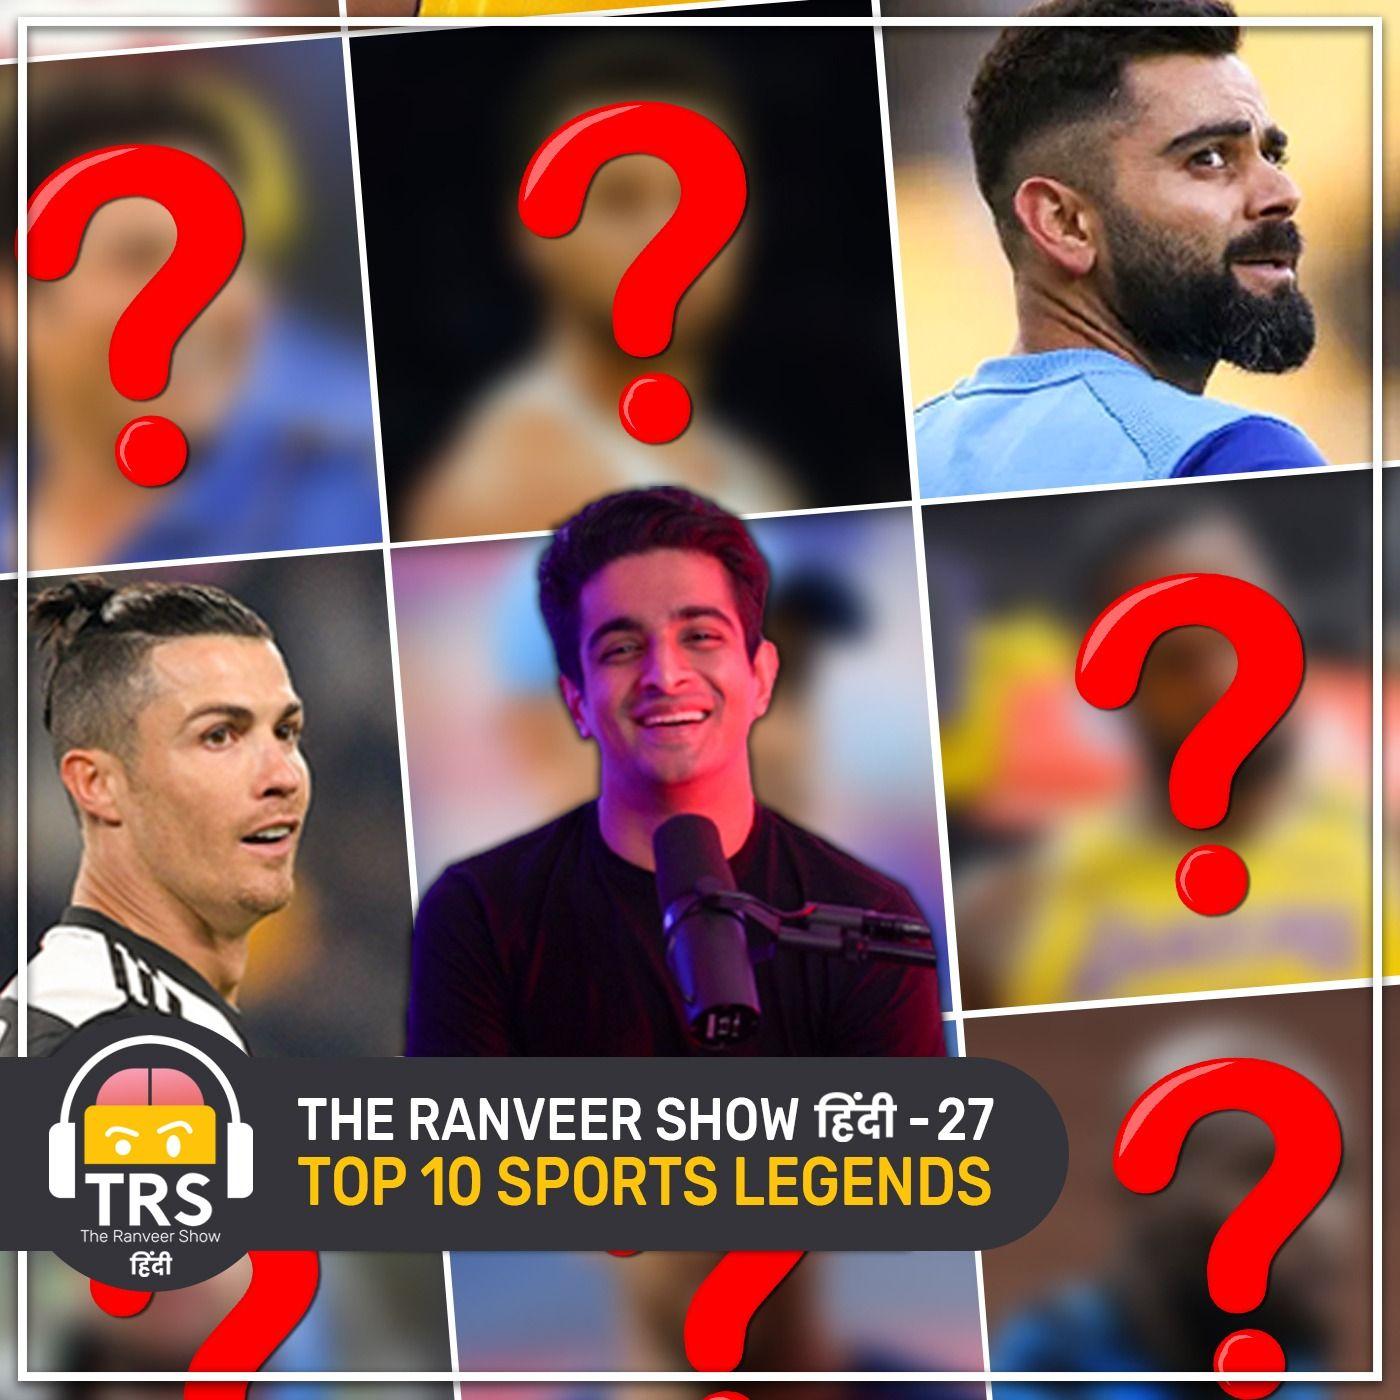 Haarne Ka Mann Kare Toh Yeh Dekh Lena 🔥 | Top 10 Sportsmen Of All Time | The Ranveer Show हिंदी 27